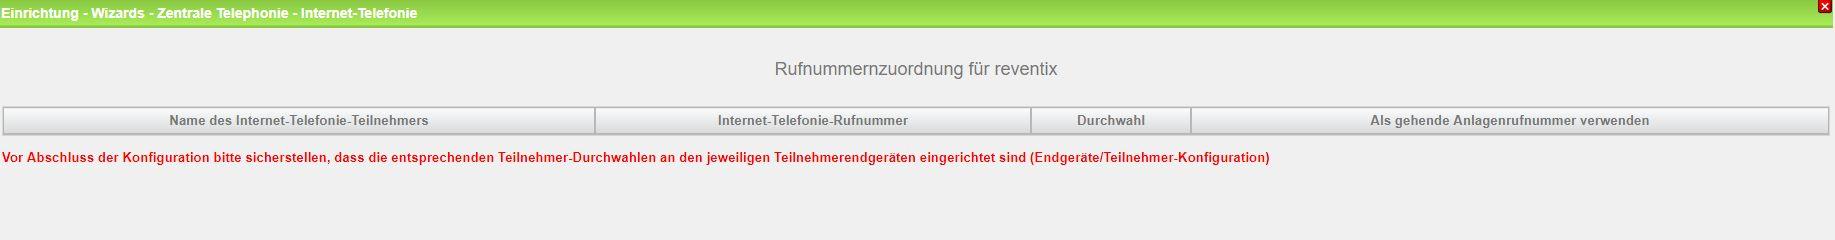 konfigurationshilfen:unify:unify-openscape-business-v2-reventix.de-10.jpg